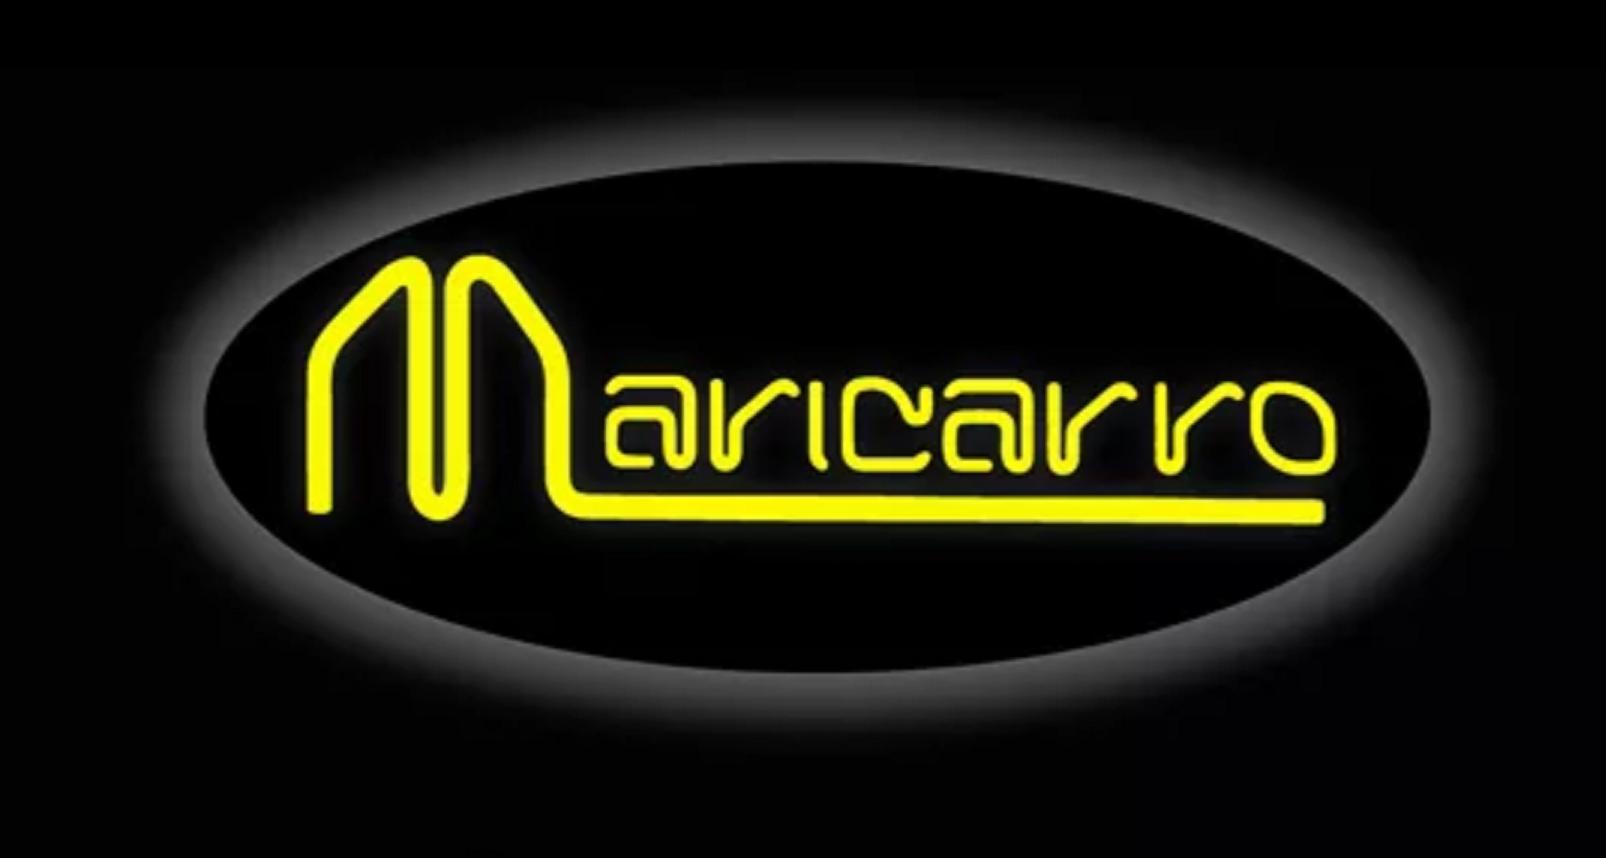 MARICARRO